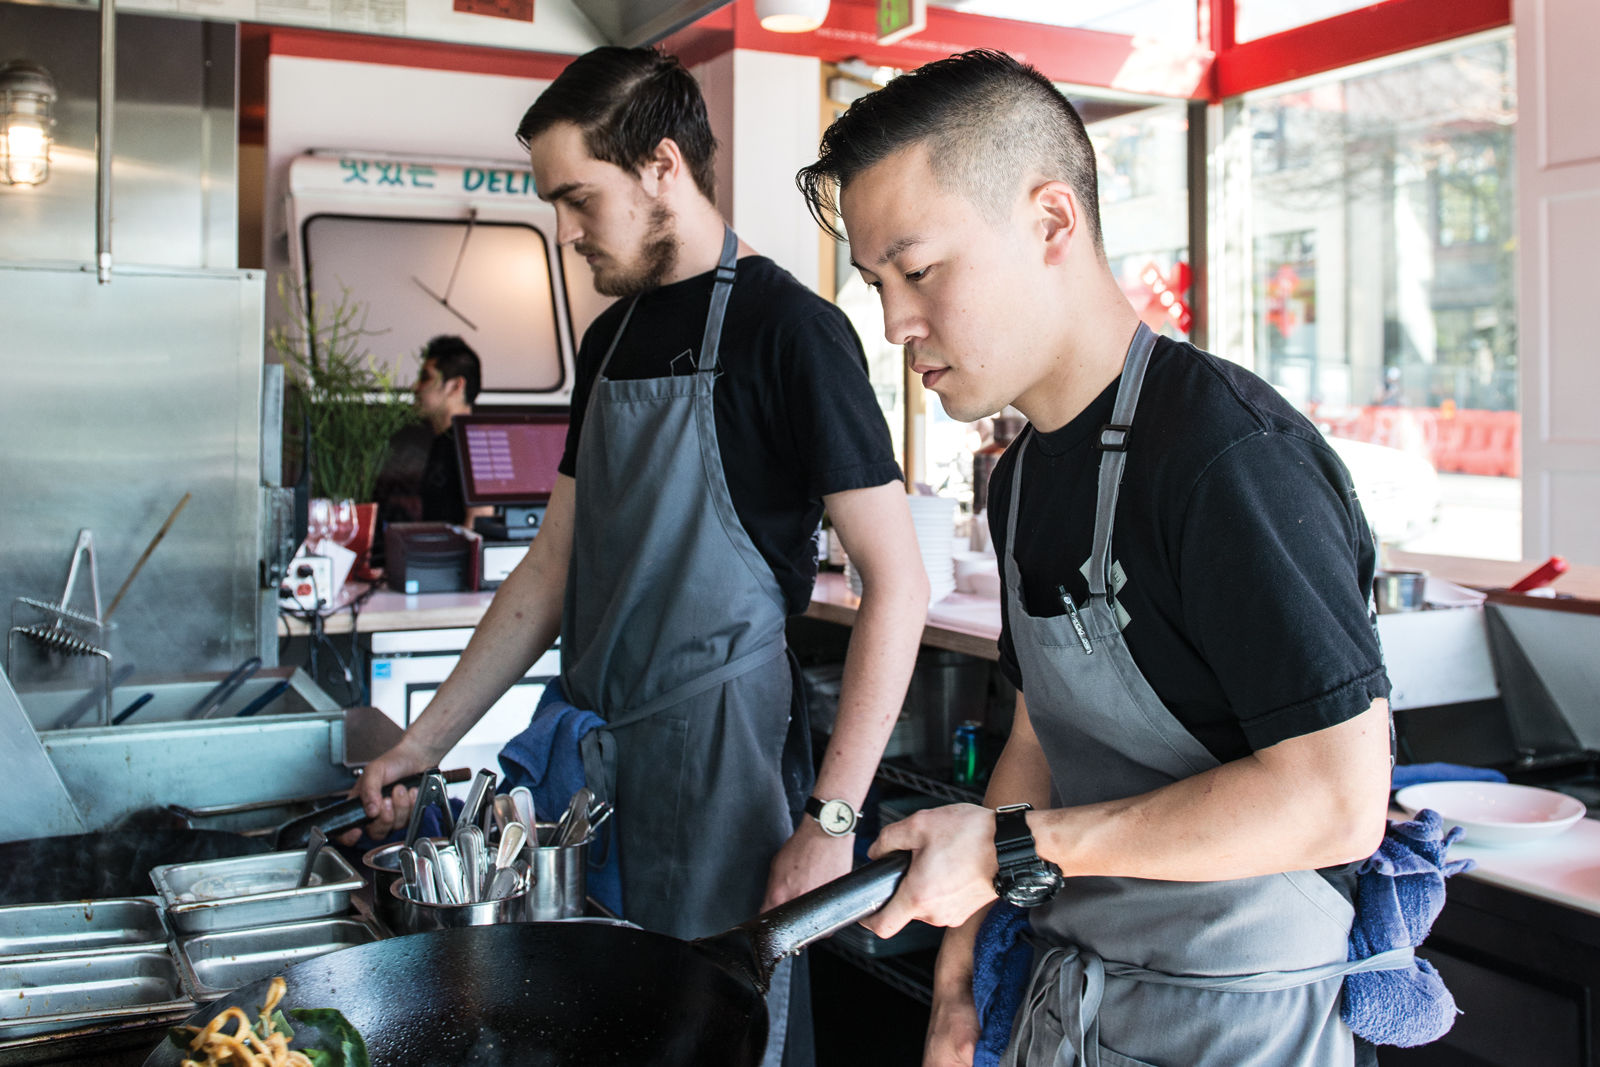 Seattle next hot chefs 2016 10 ijcloa oavsrt